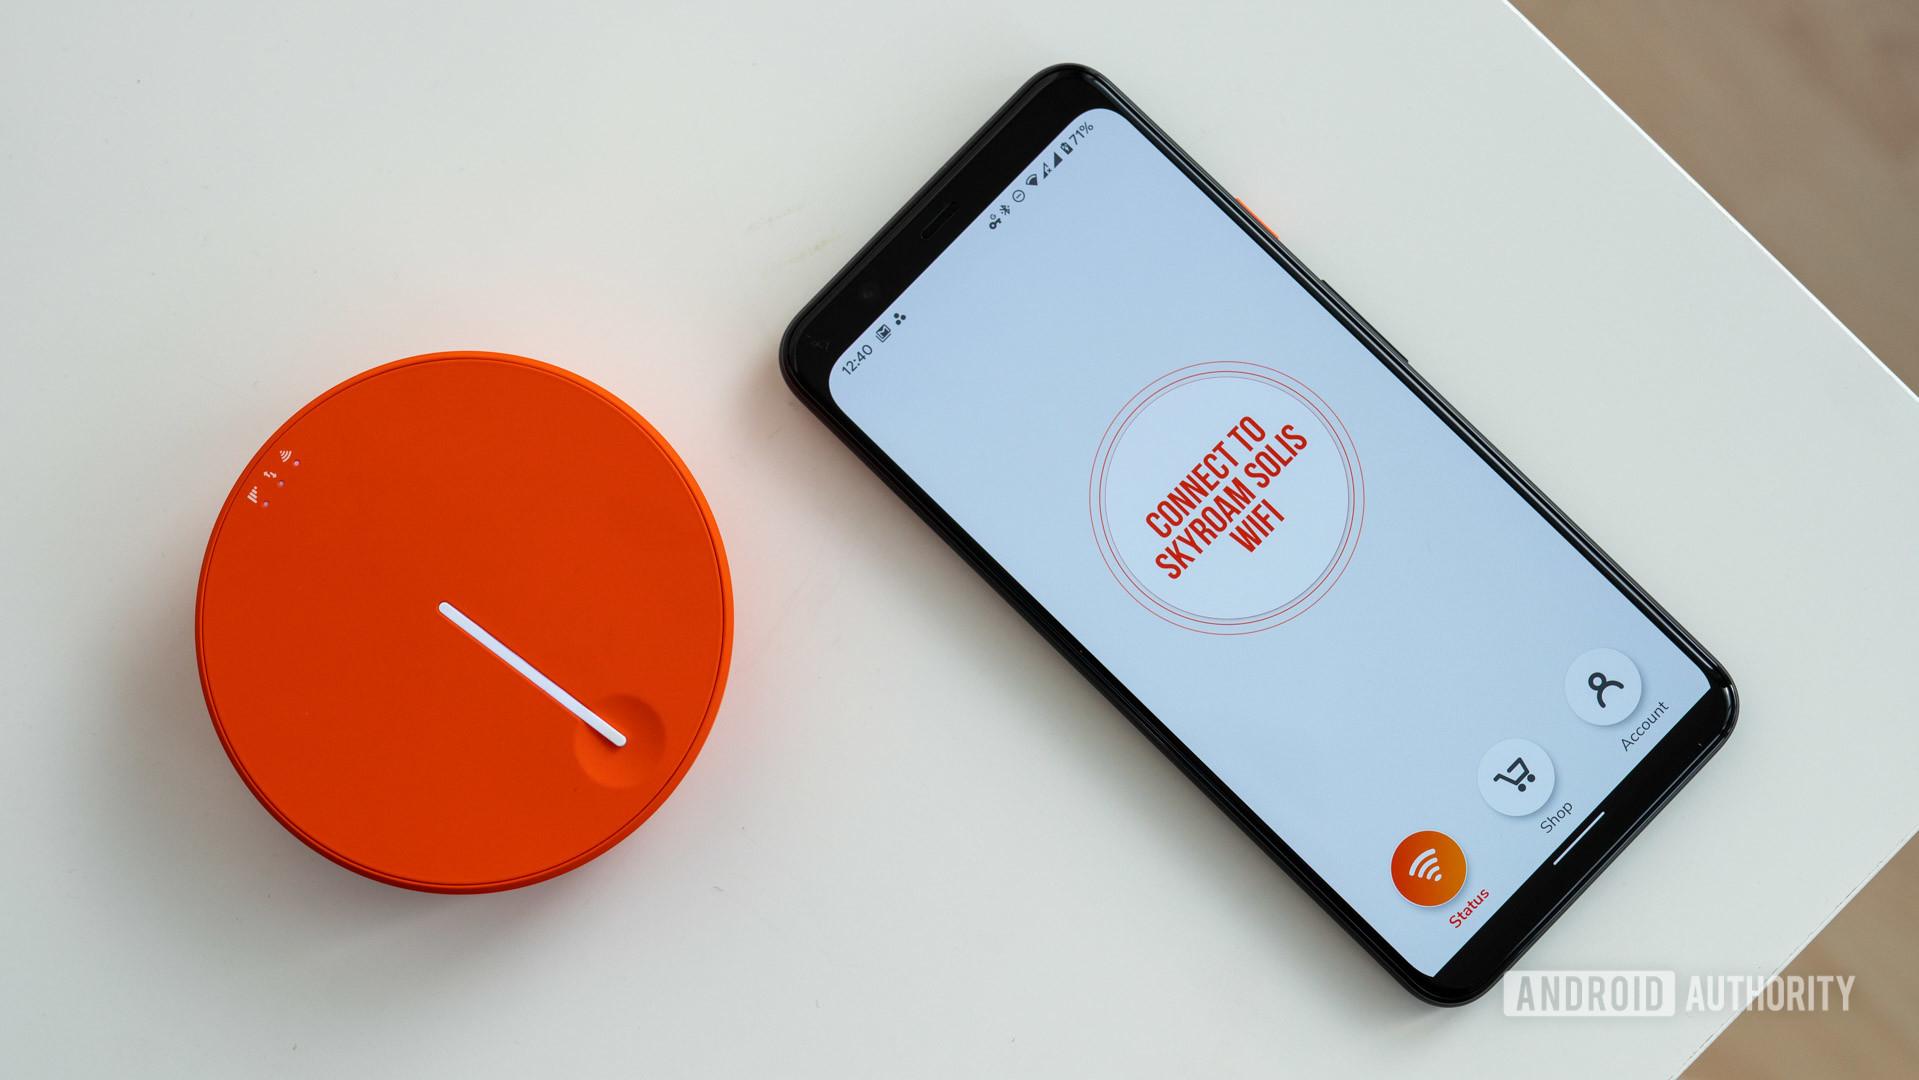 Skyroam Solis X top view with smartphone